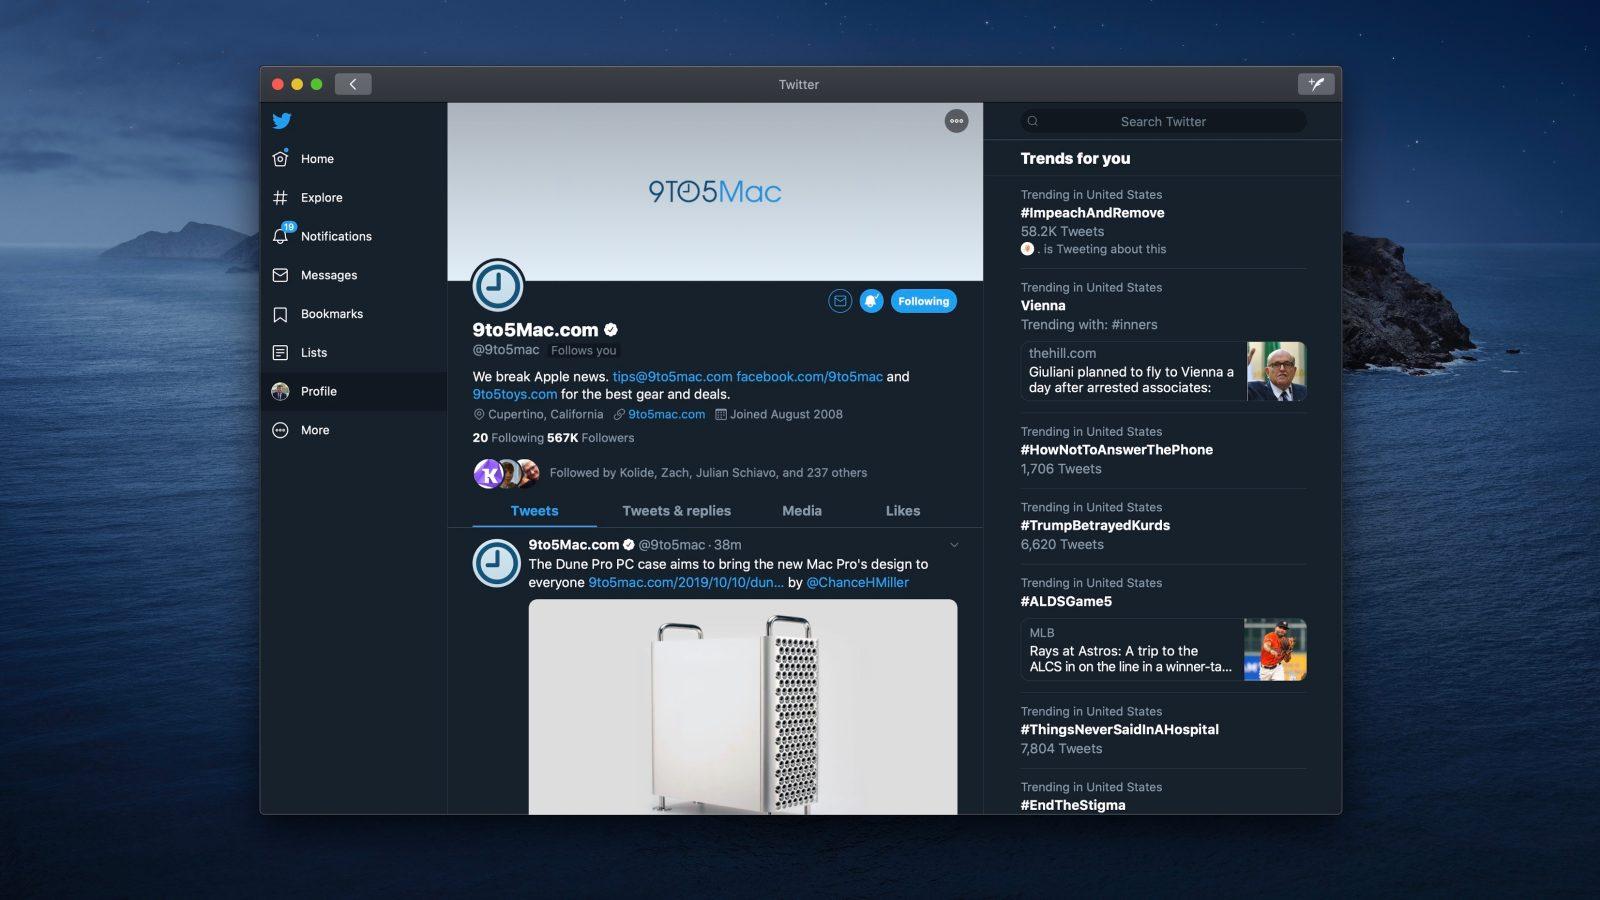 9to5mac Apple News Mac Rumors Breaking All Day